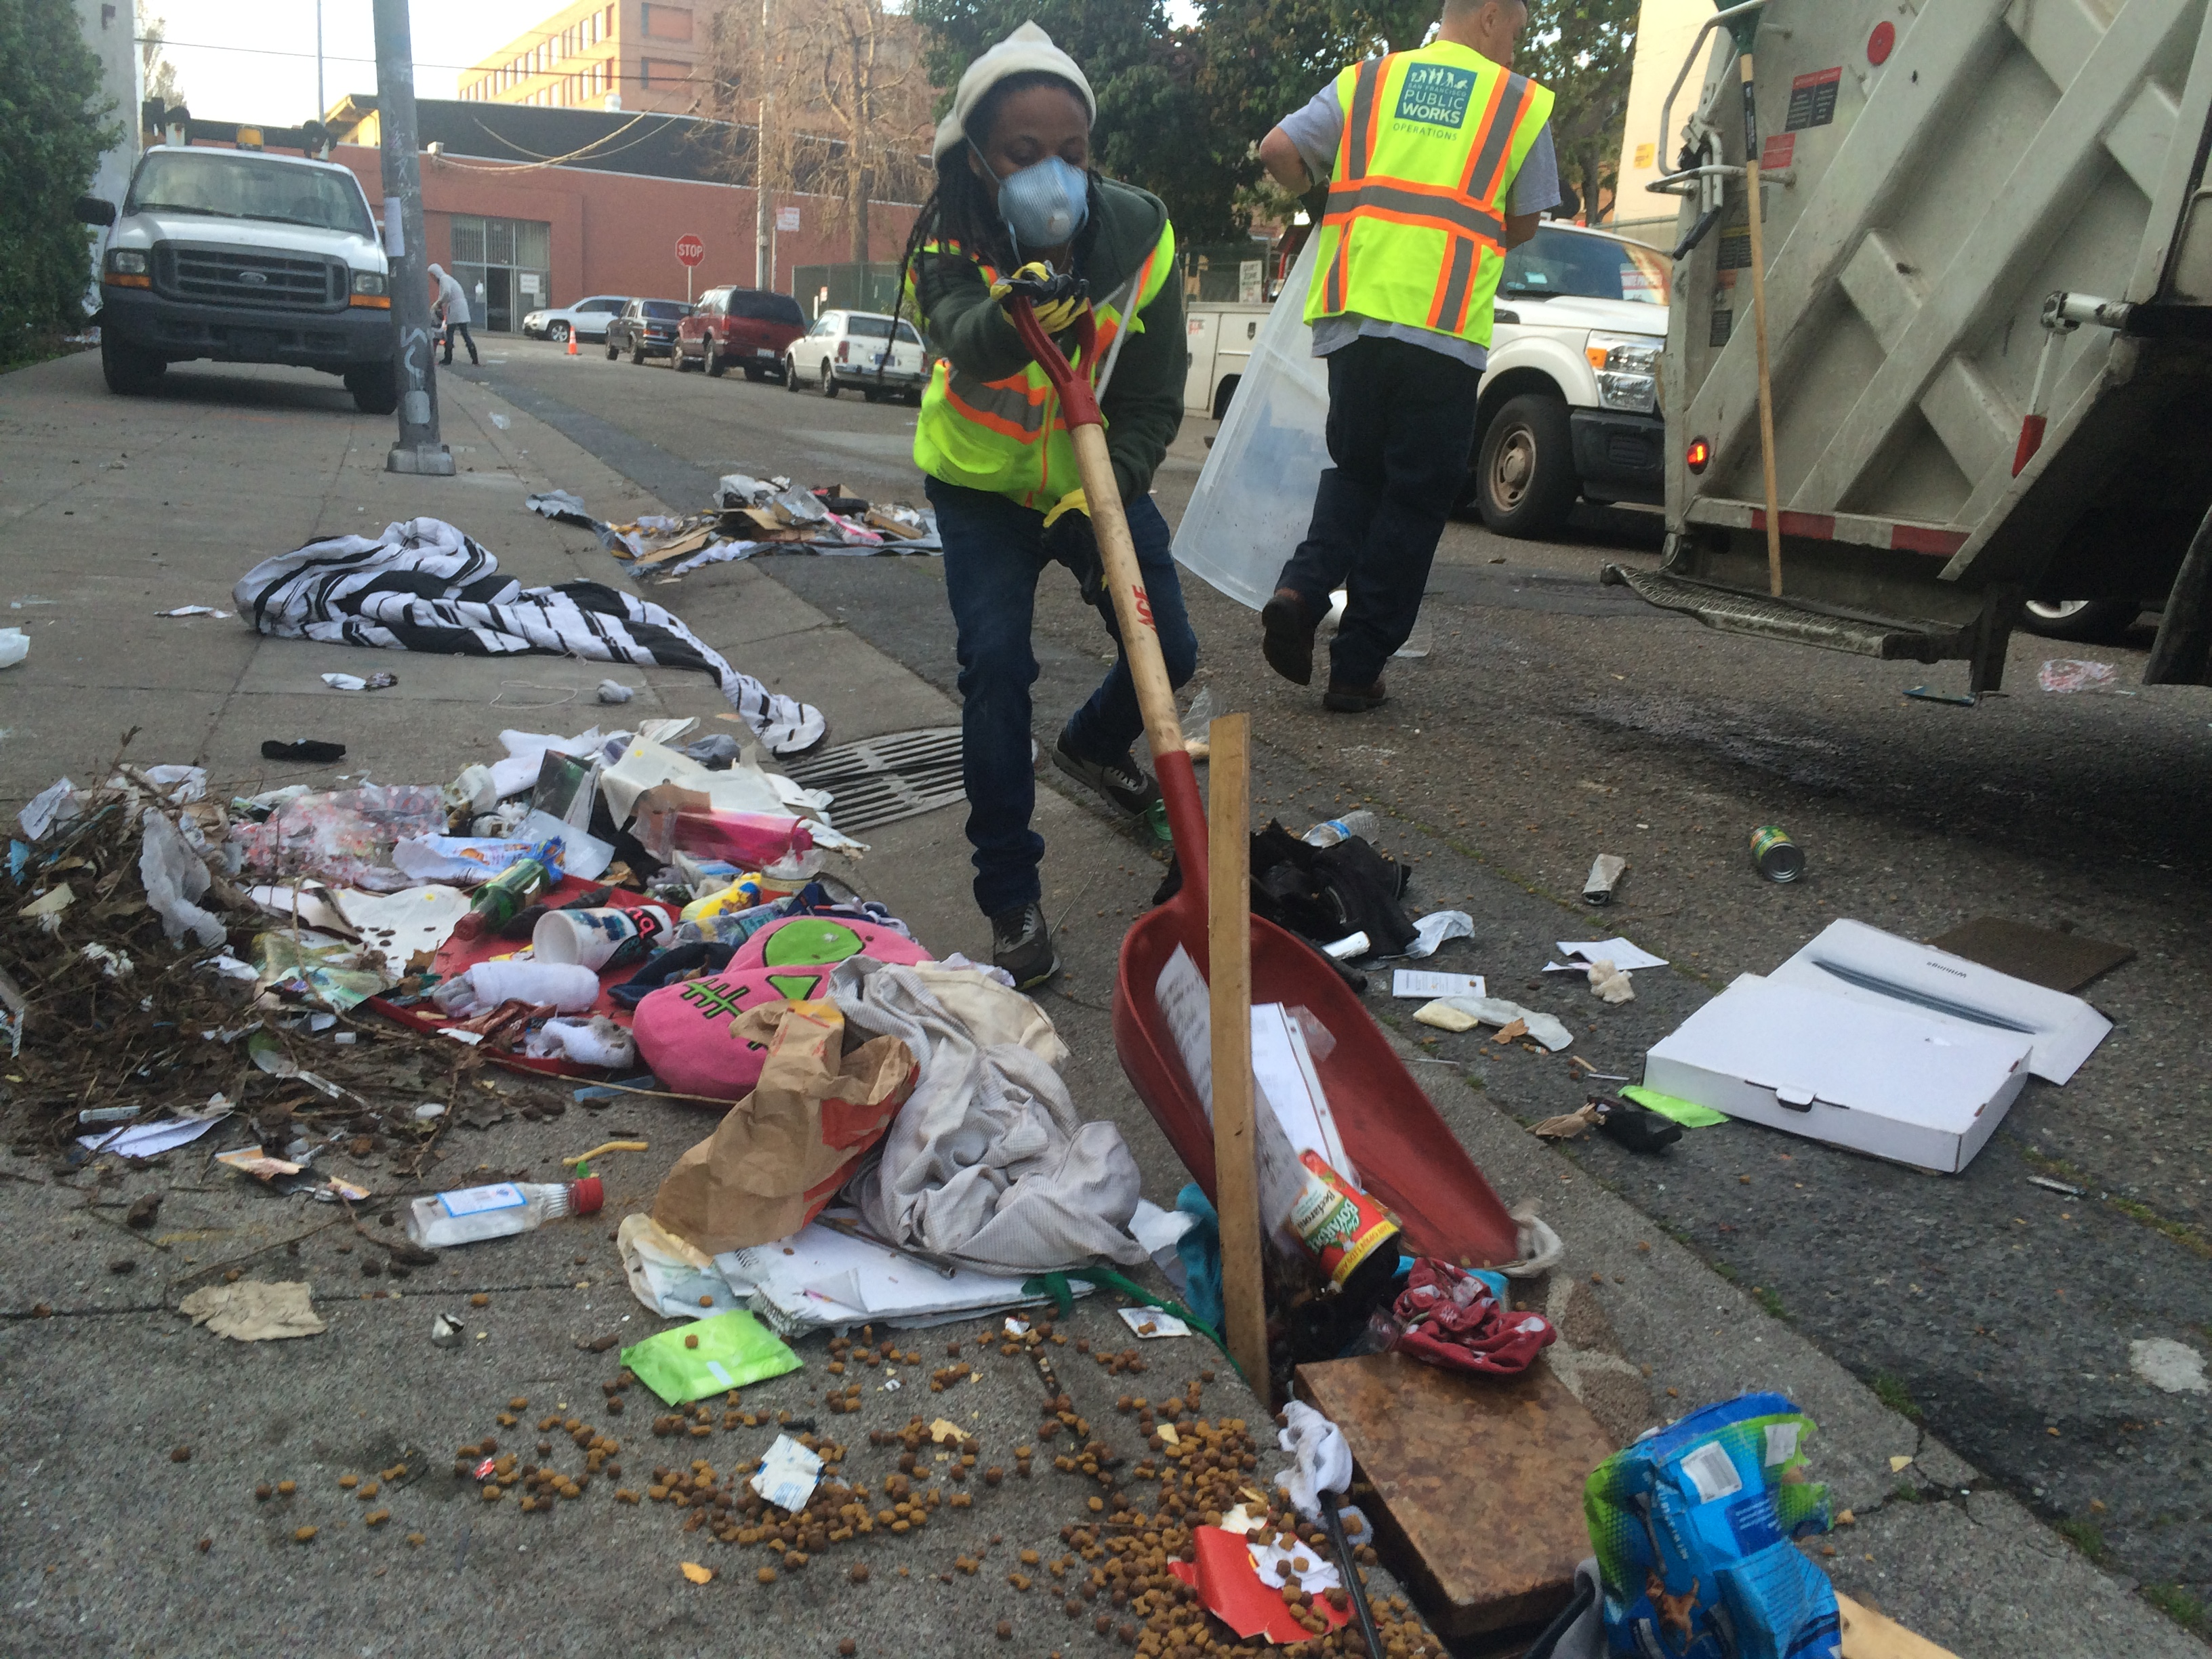 Worker cleaning litter-strewn street